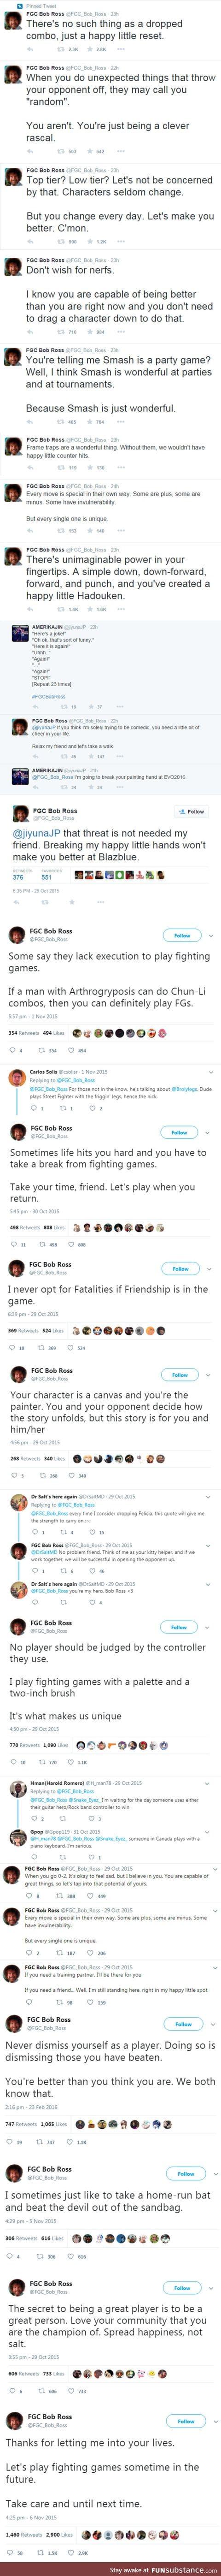 Bob ross lives on